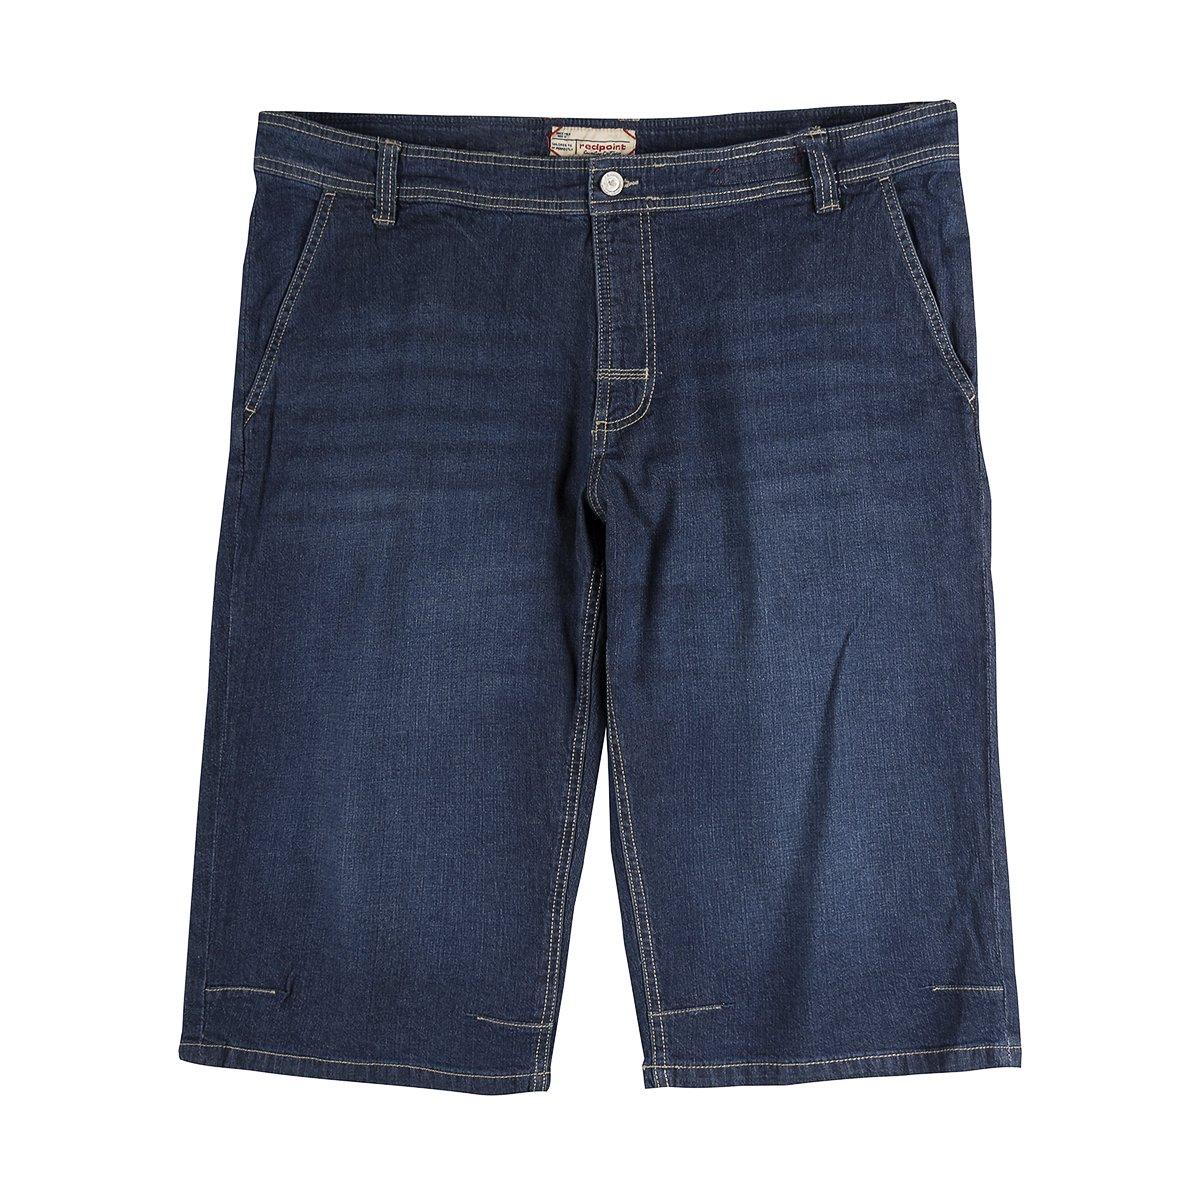 ROTpoint Capri-Jeans große Größen dark stone